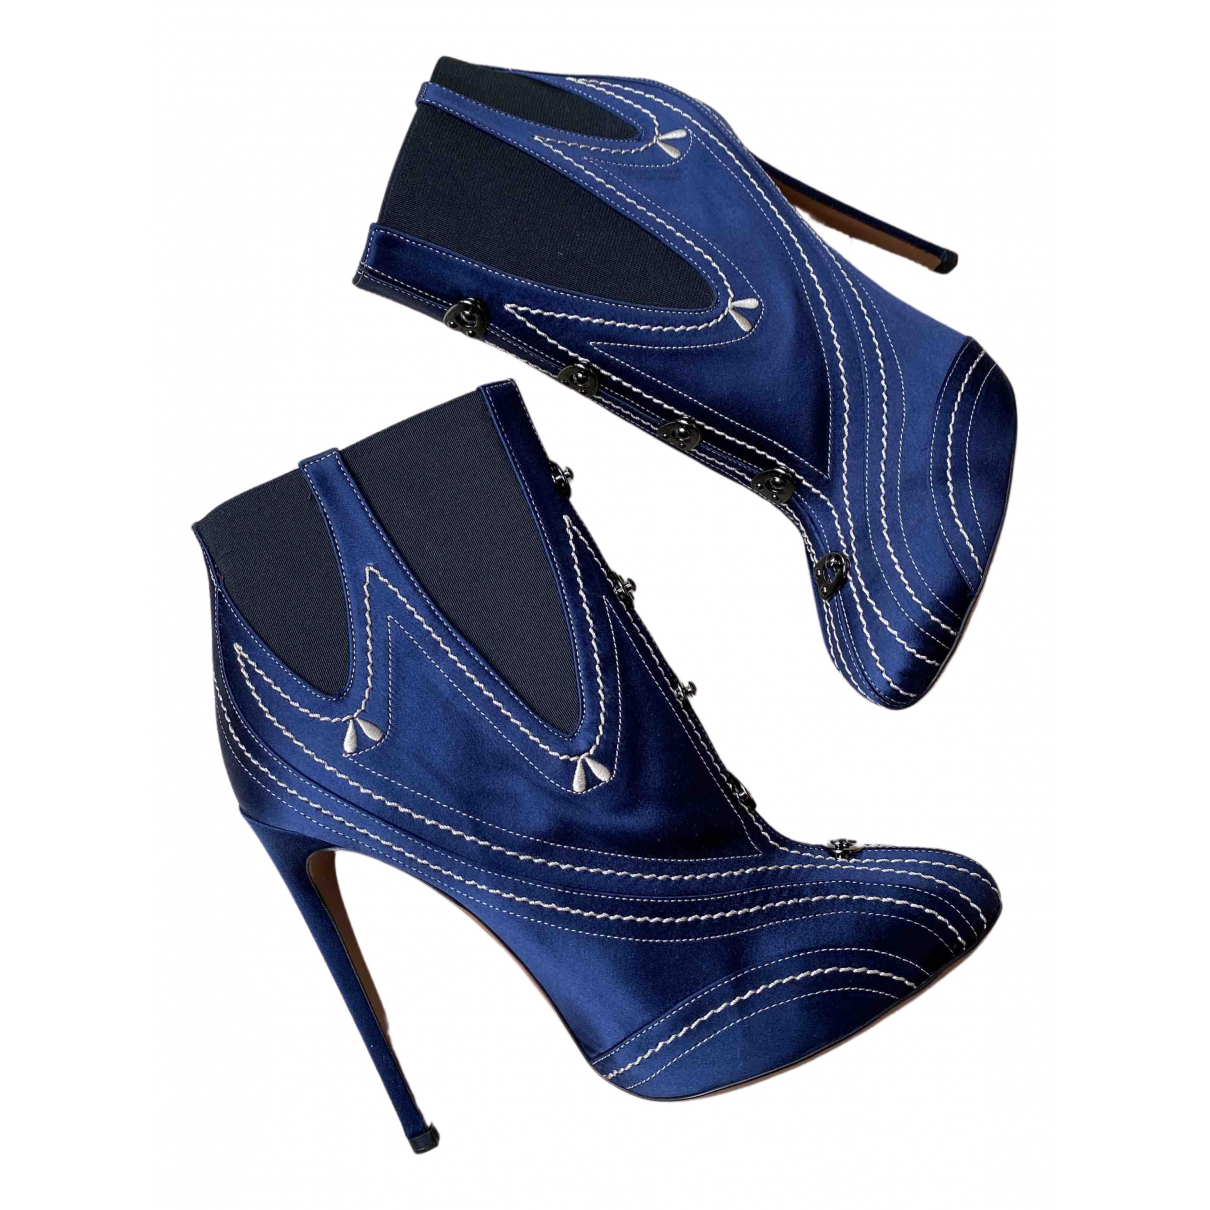 Alaïa N Blue Leather Ankle boots for Women 40 EU